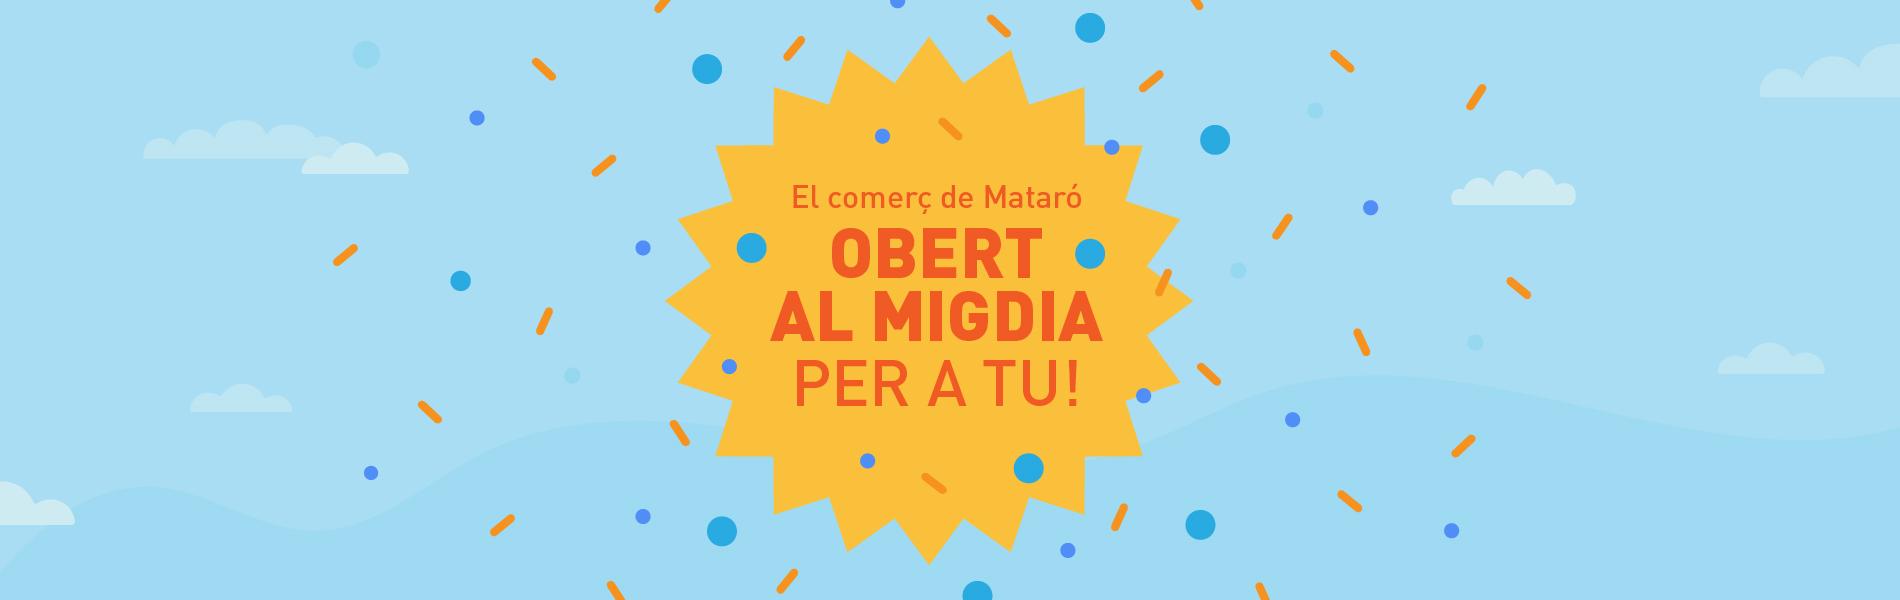 Banner_web_Migdia